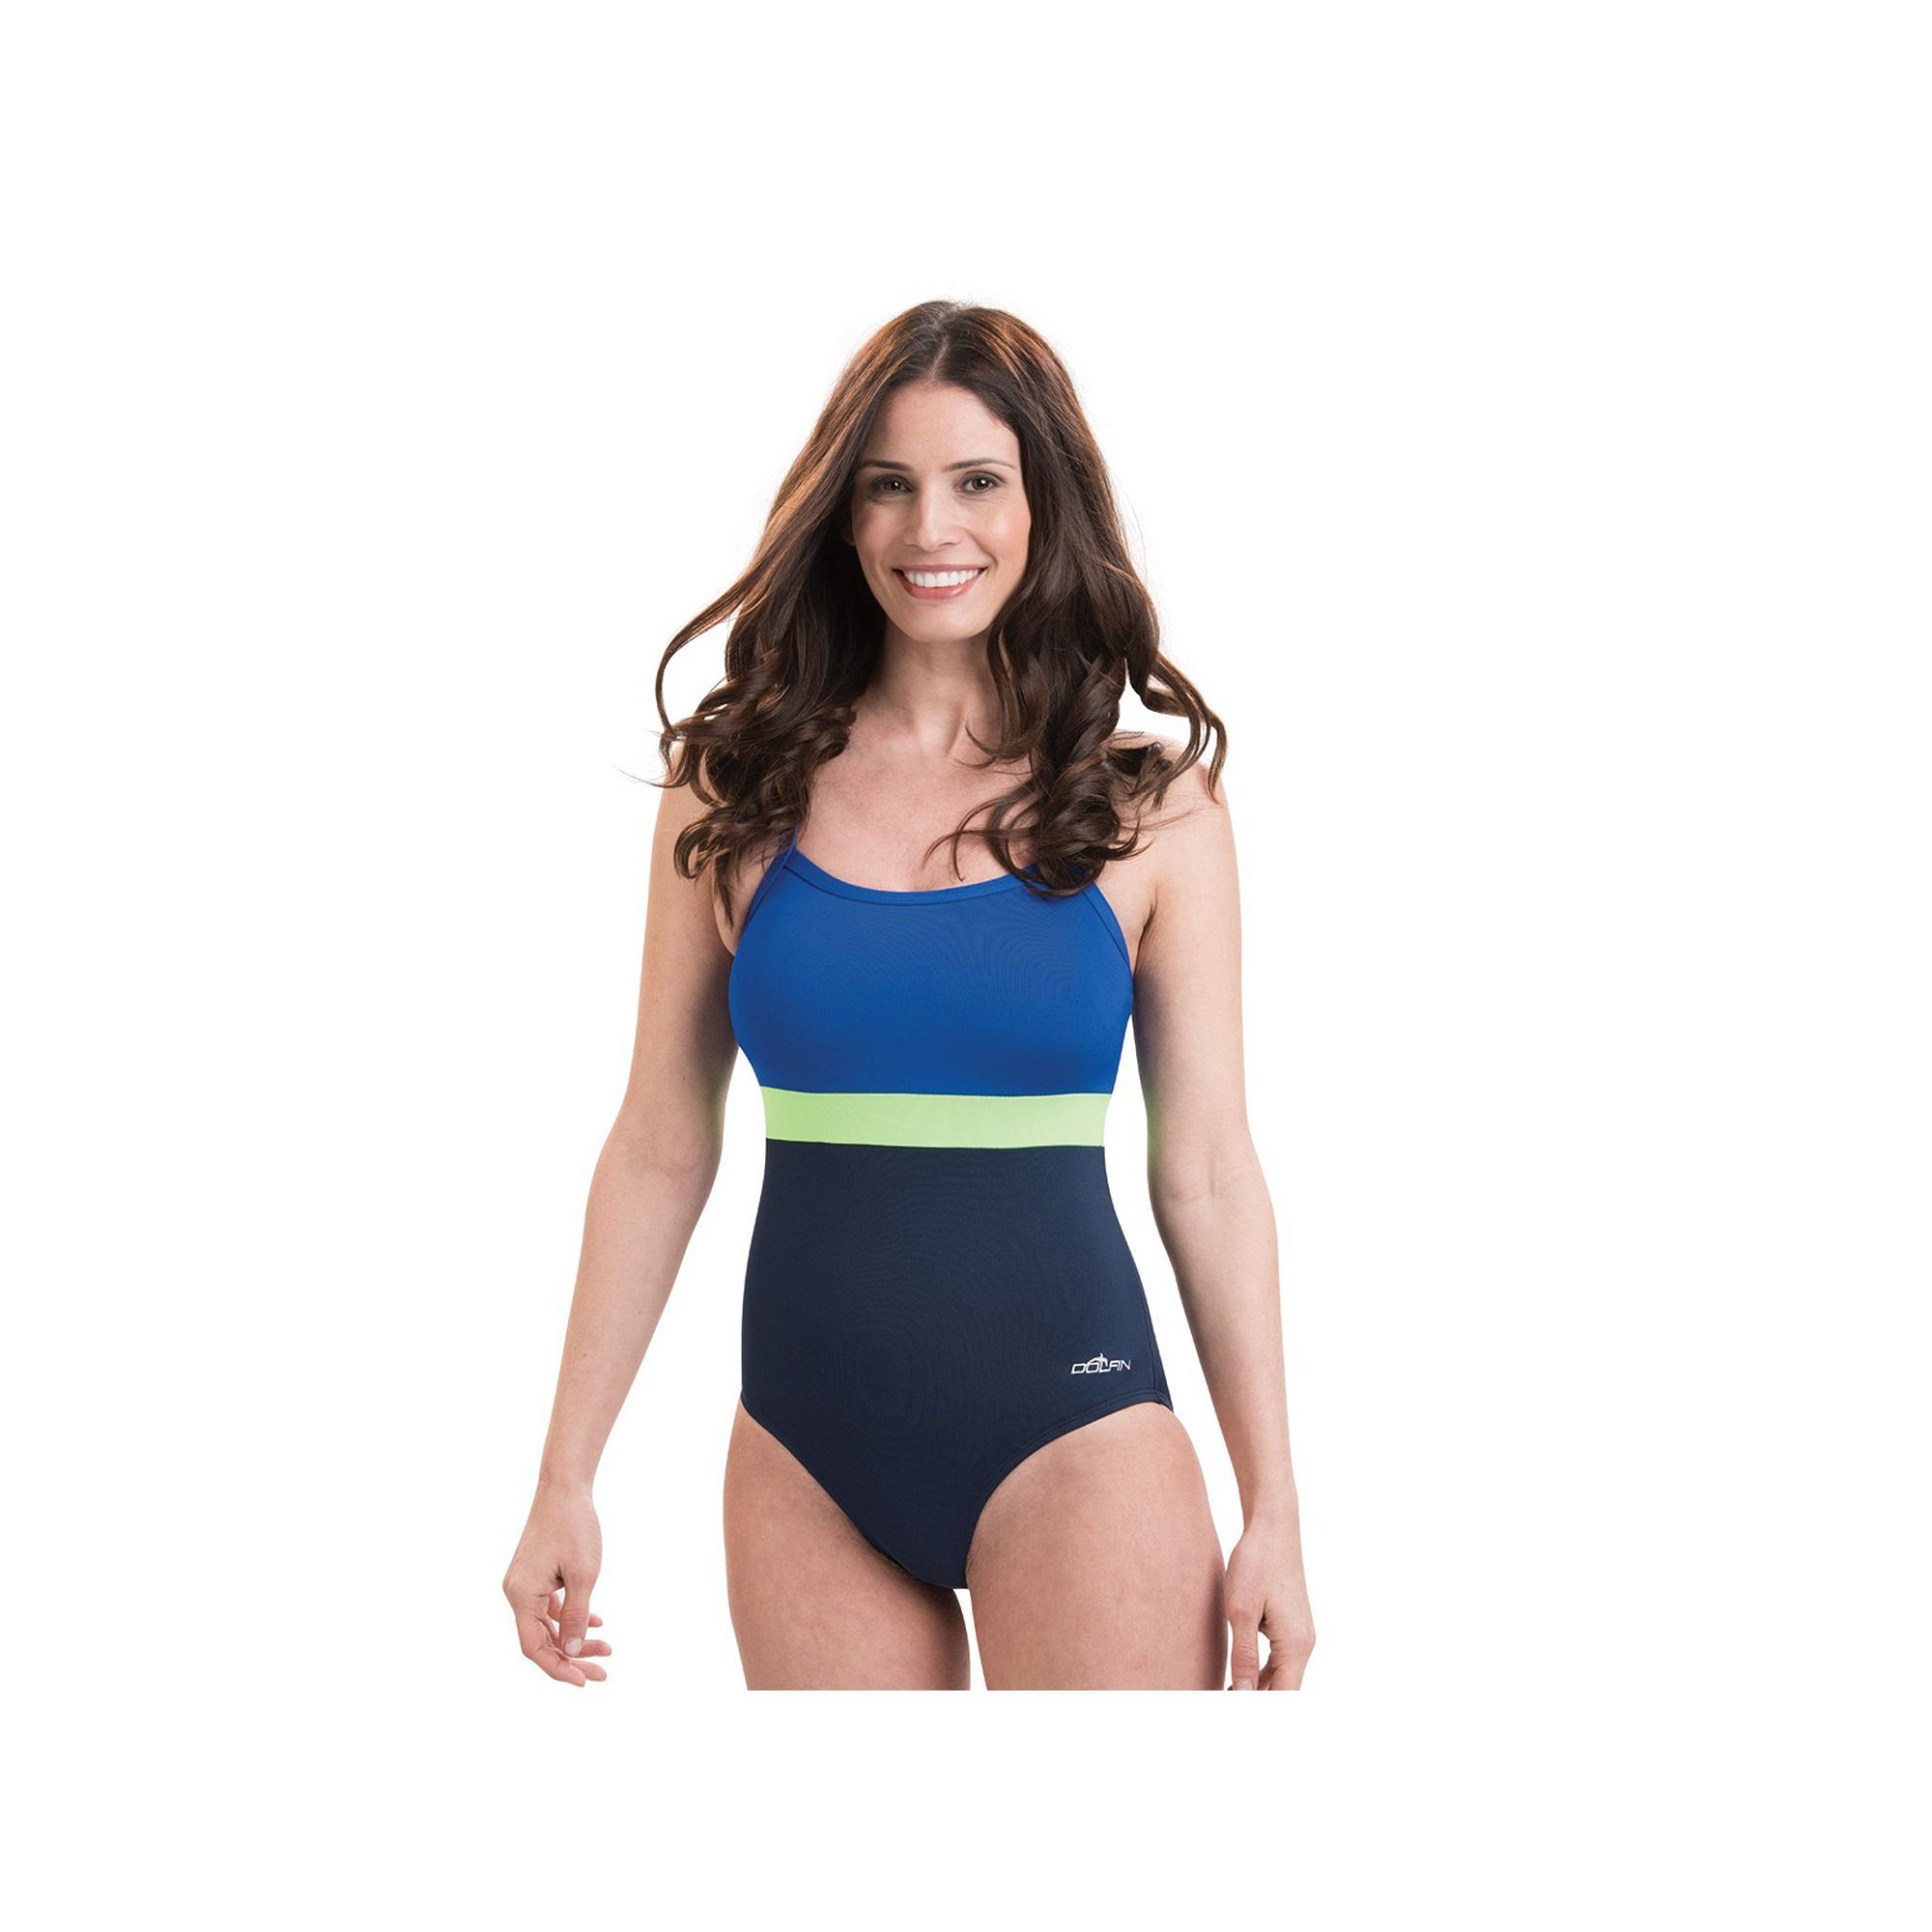 91354acb355 Plus Size Women s Dolfin Colorblock X-Back One-Piece Swimsuit